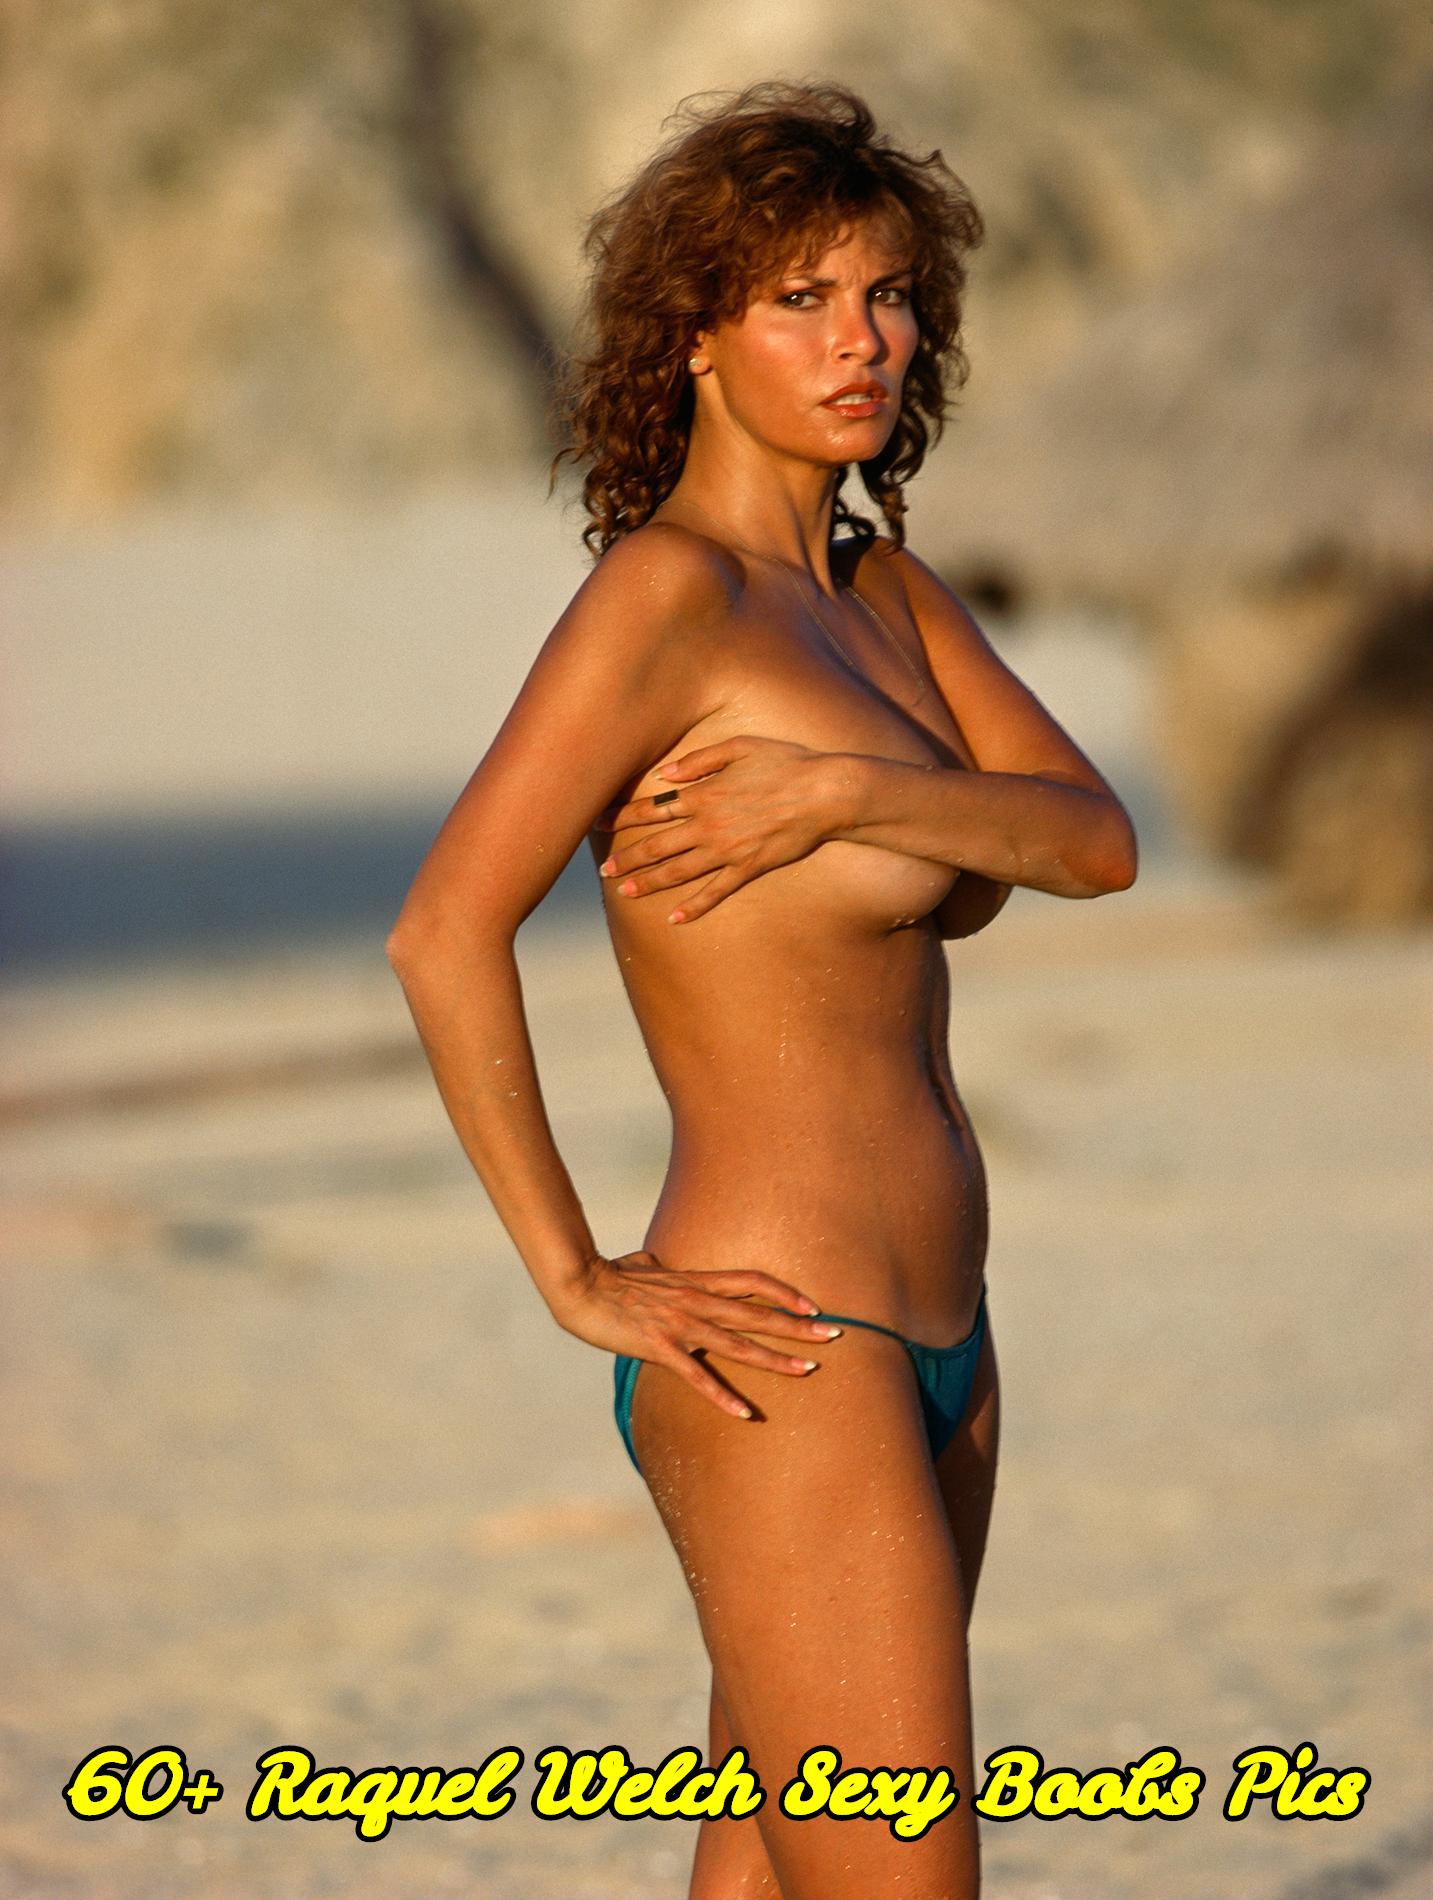 Raquel Welch sexy boobs pics